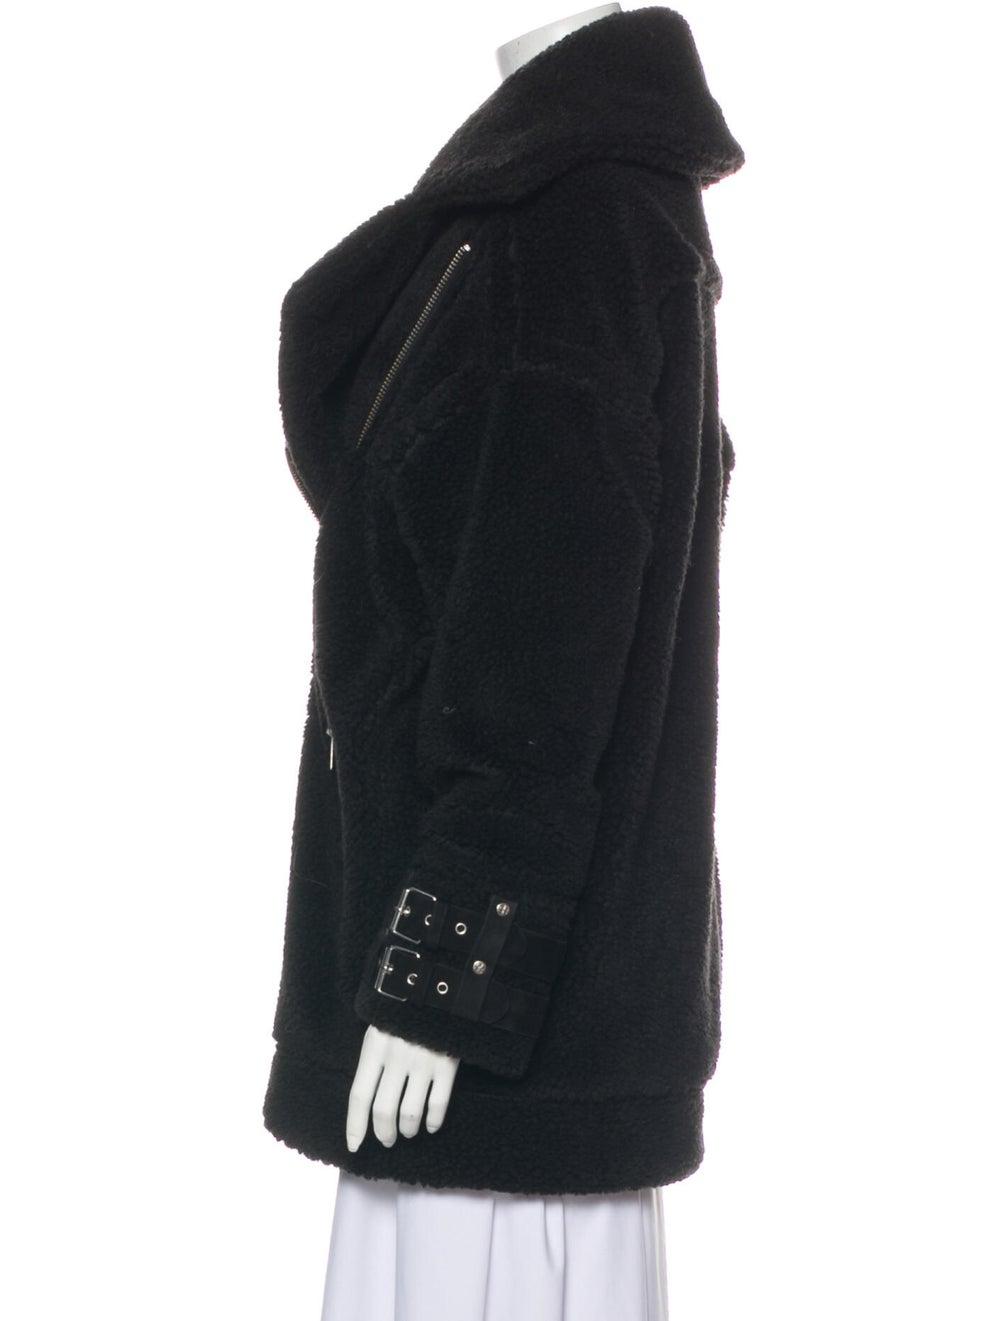 Anine Bing Coat Black - image 2